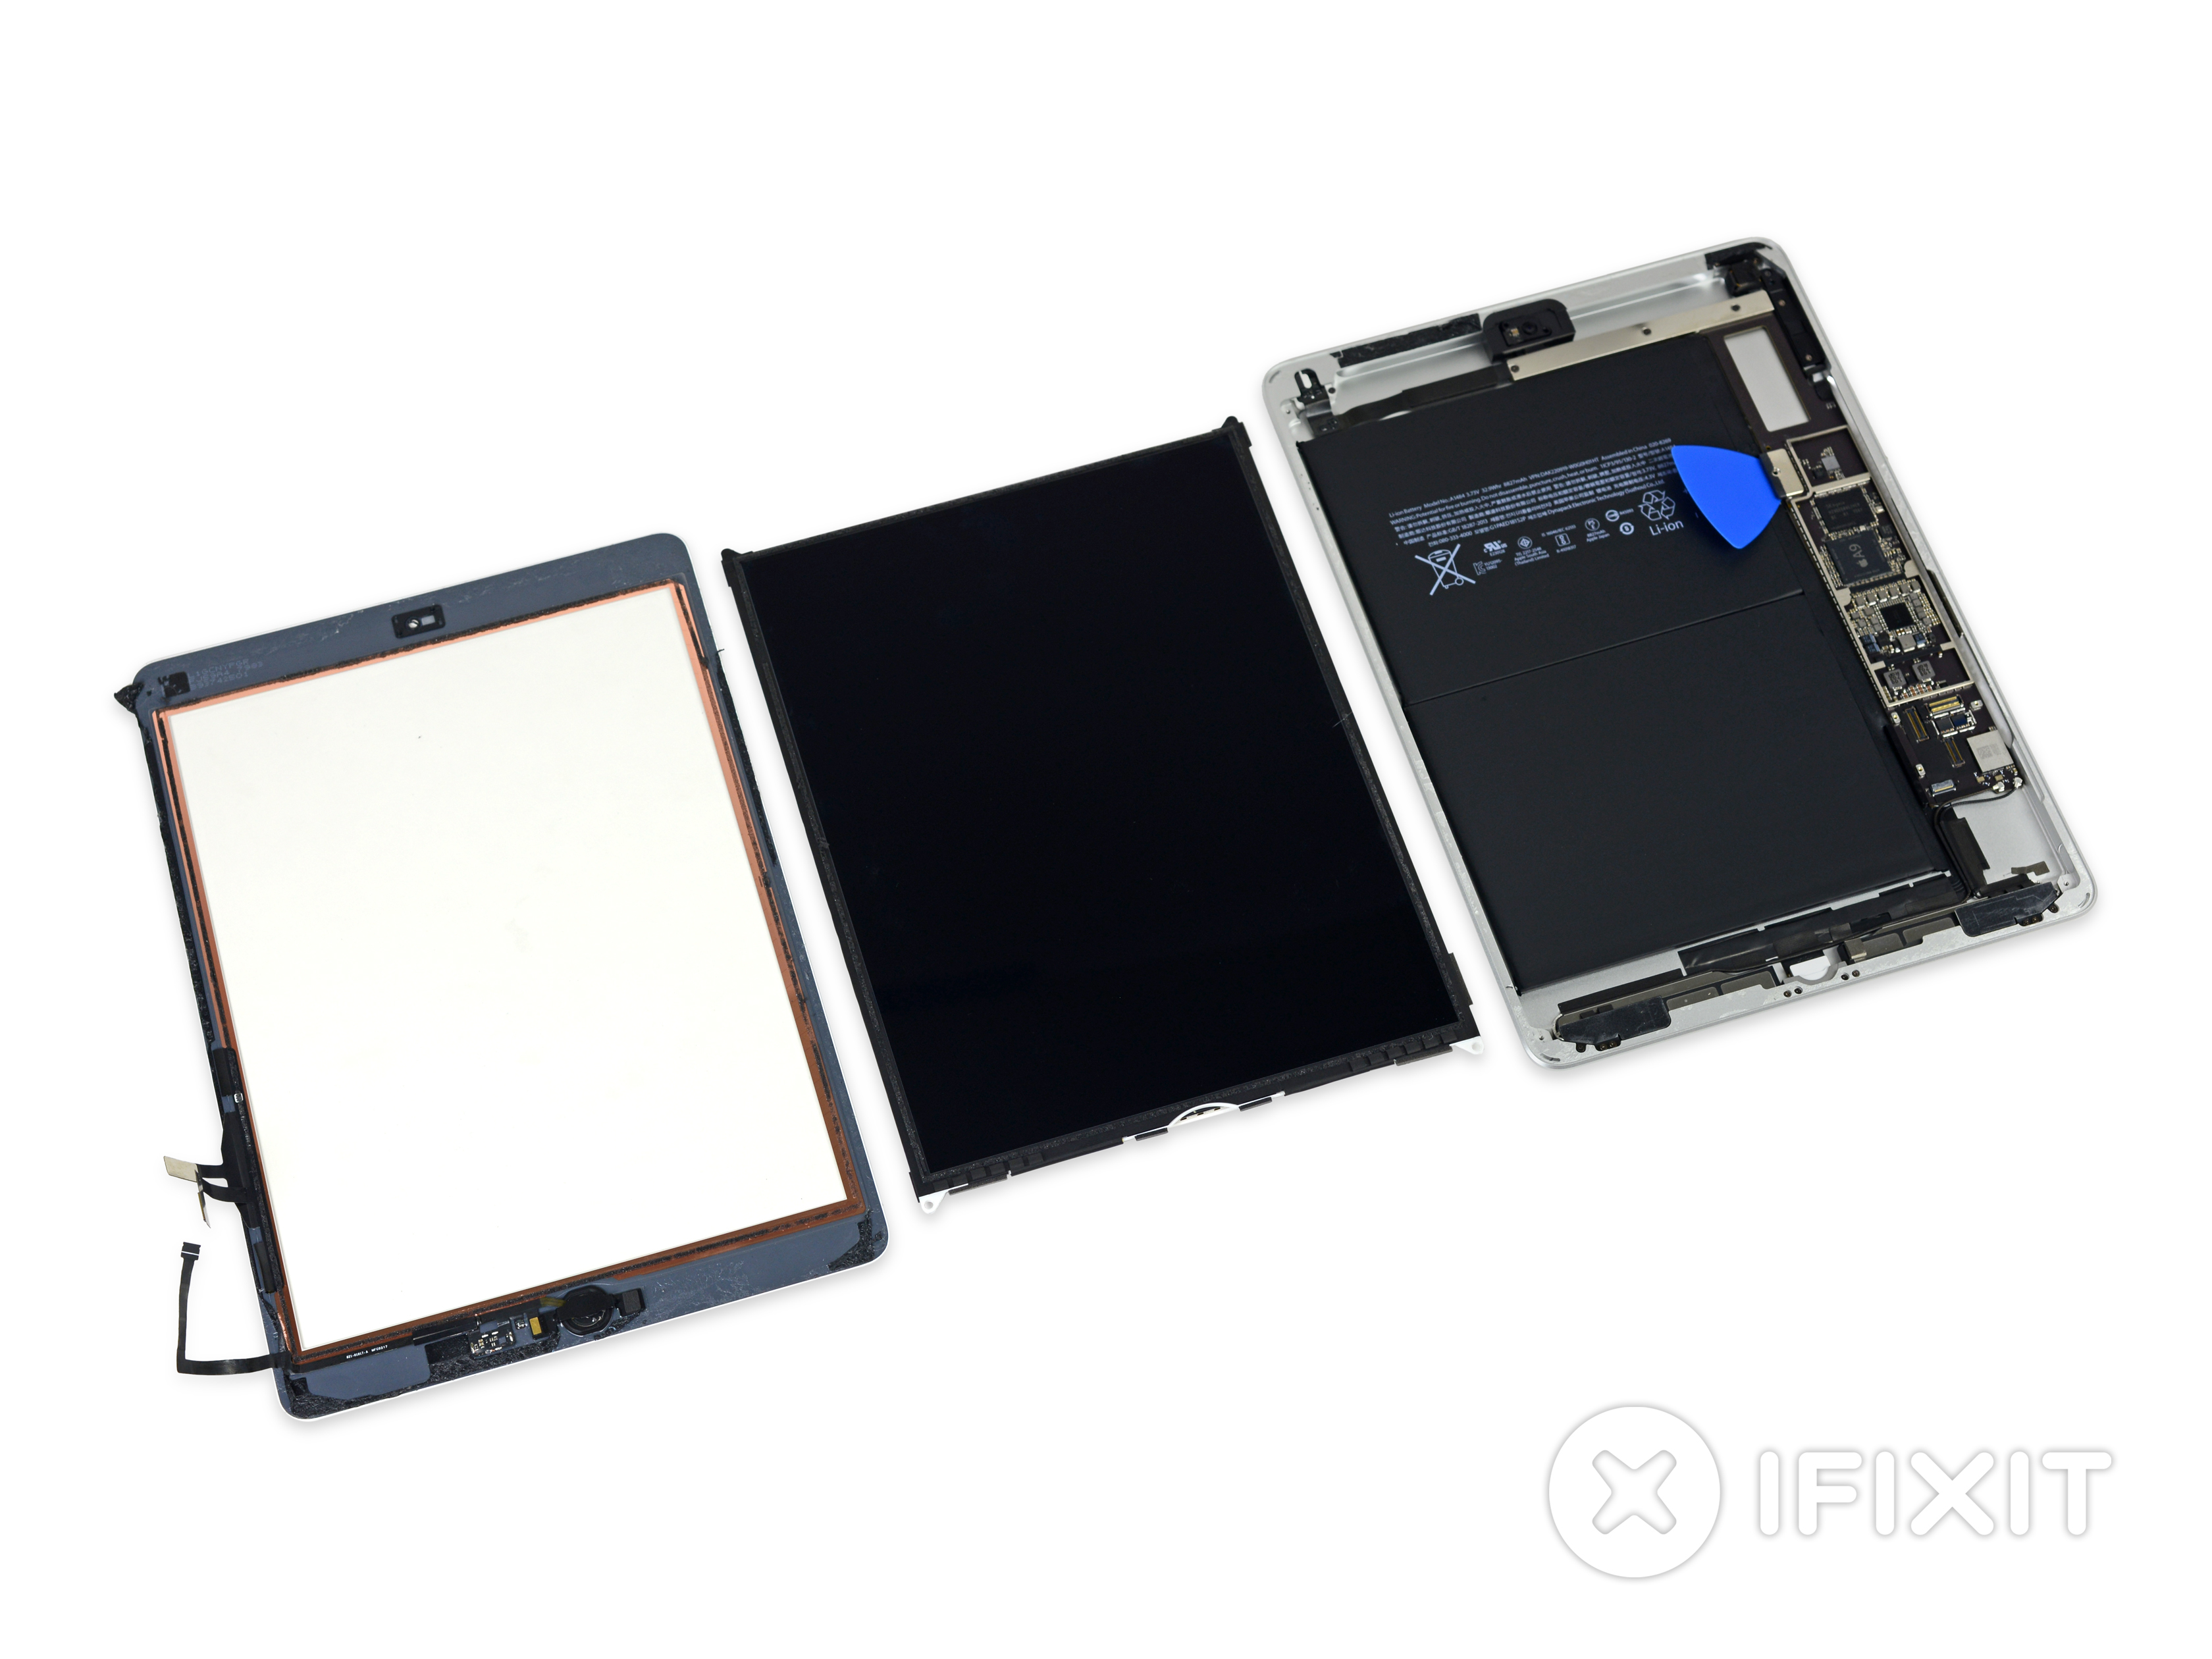 Ipad 5 Teardown Ifixit Fused Wiring Recipe Vendor